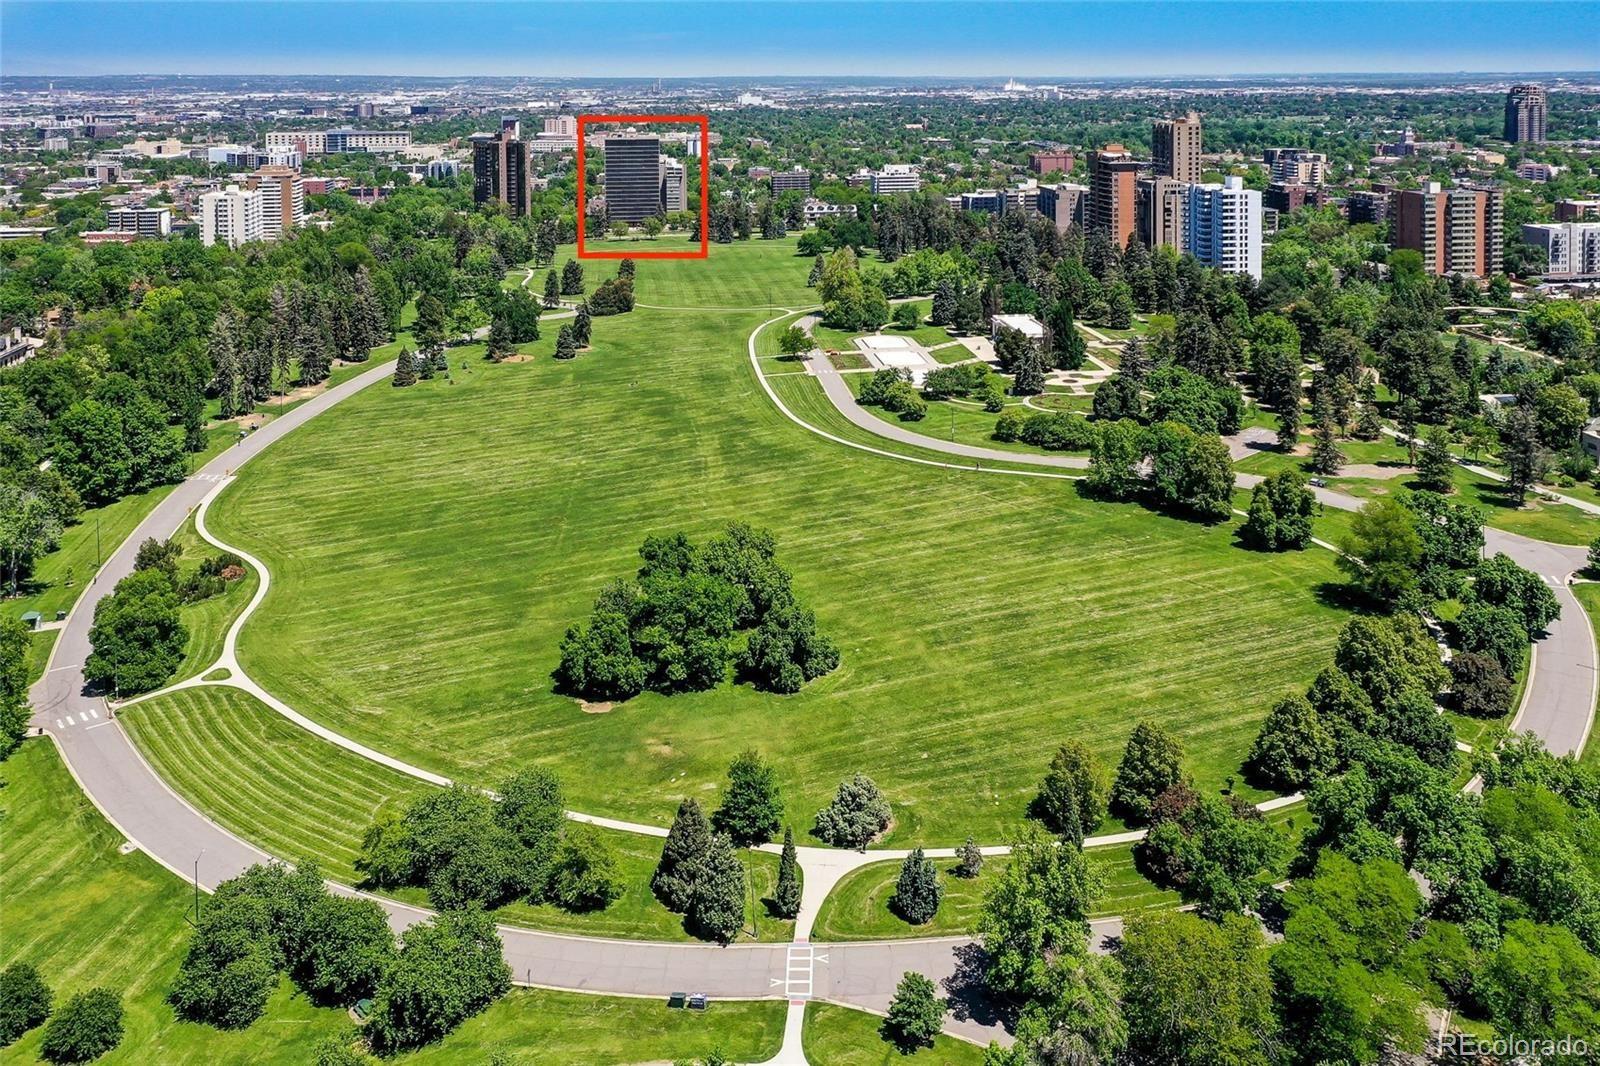 Photo of 1201 WILLIAMS Street #15C, Denver, CO 80218 (MLS # 2258792)